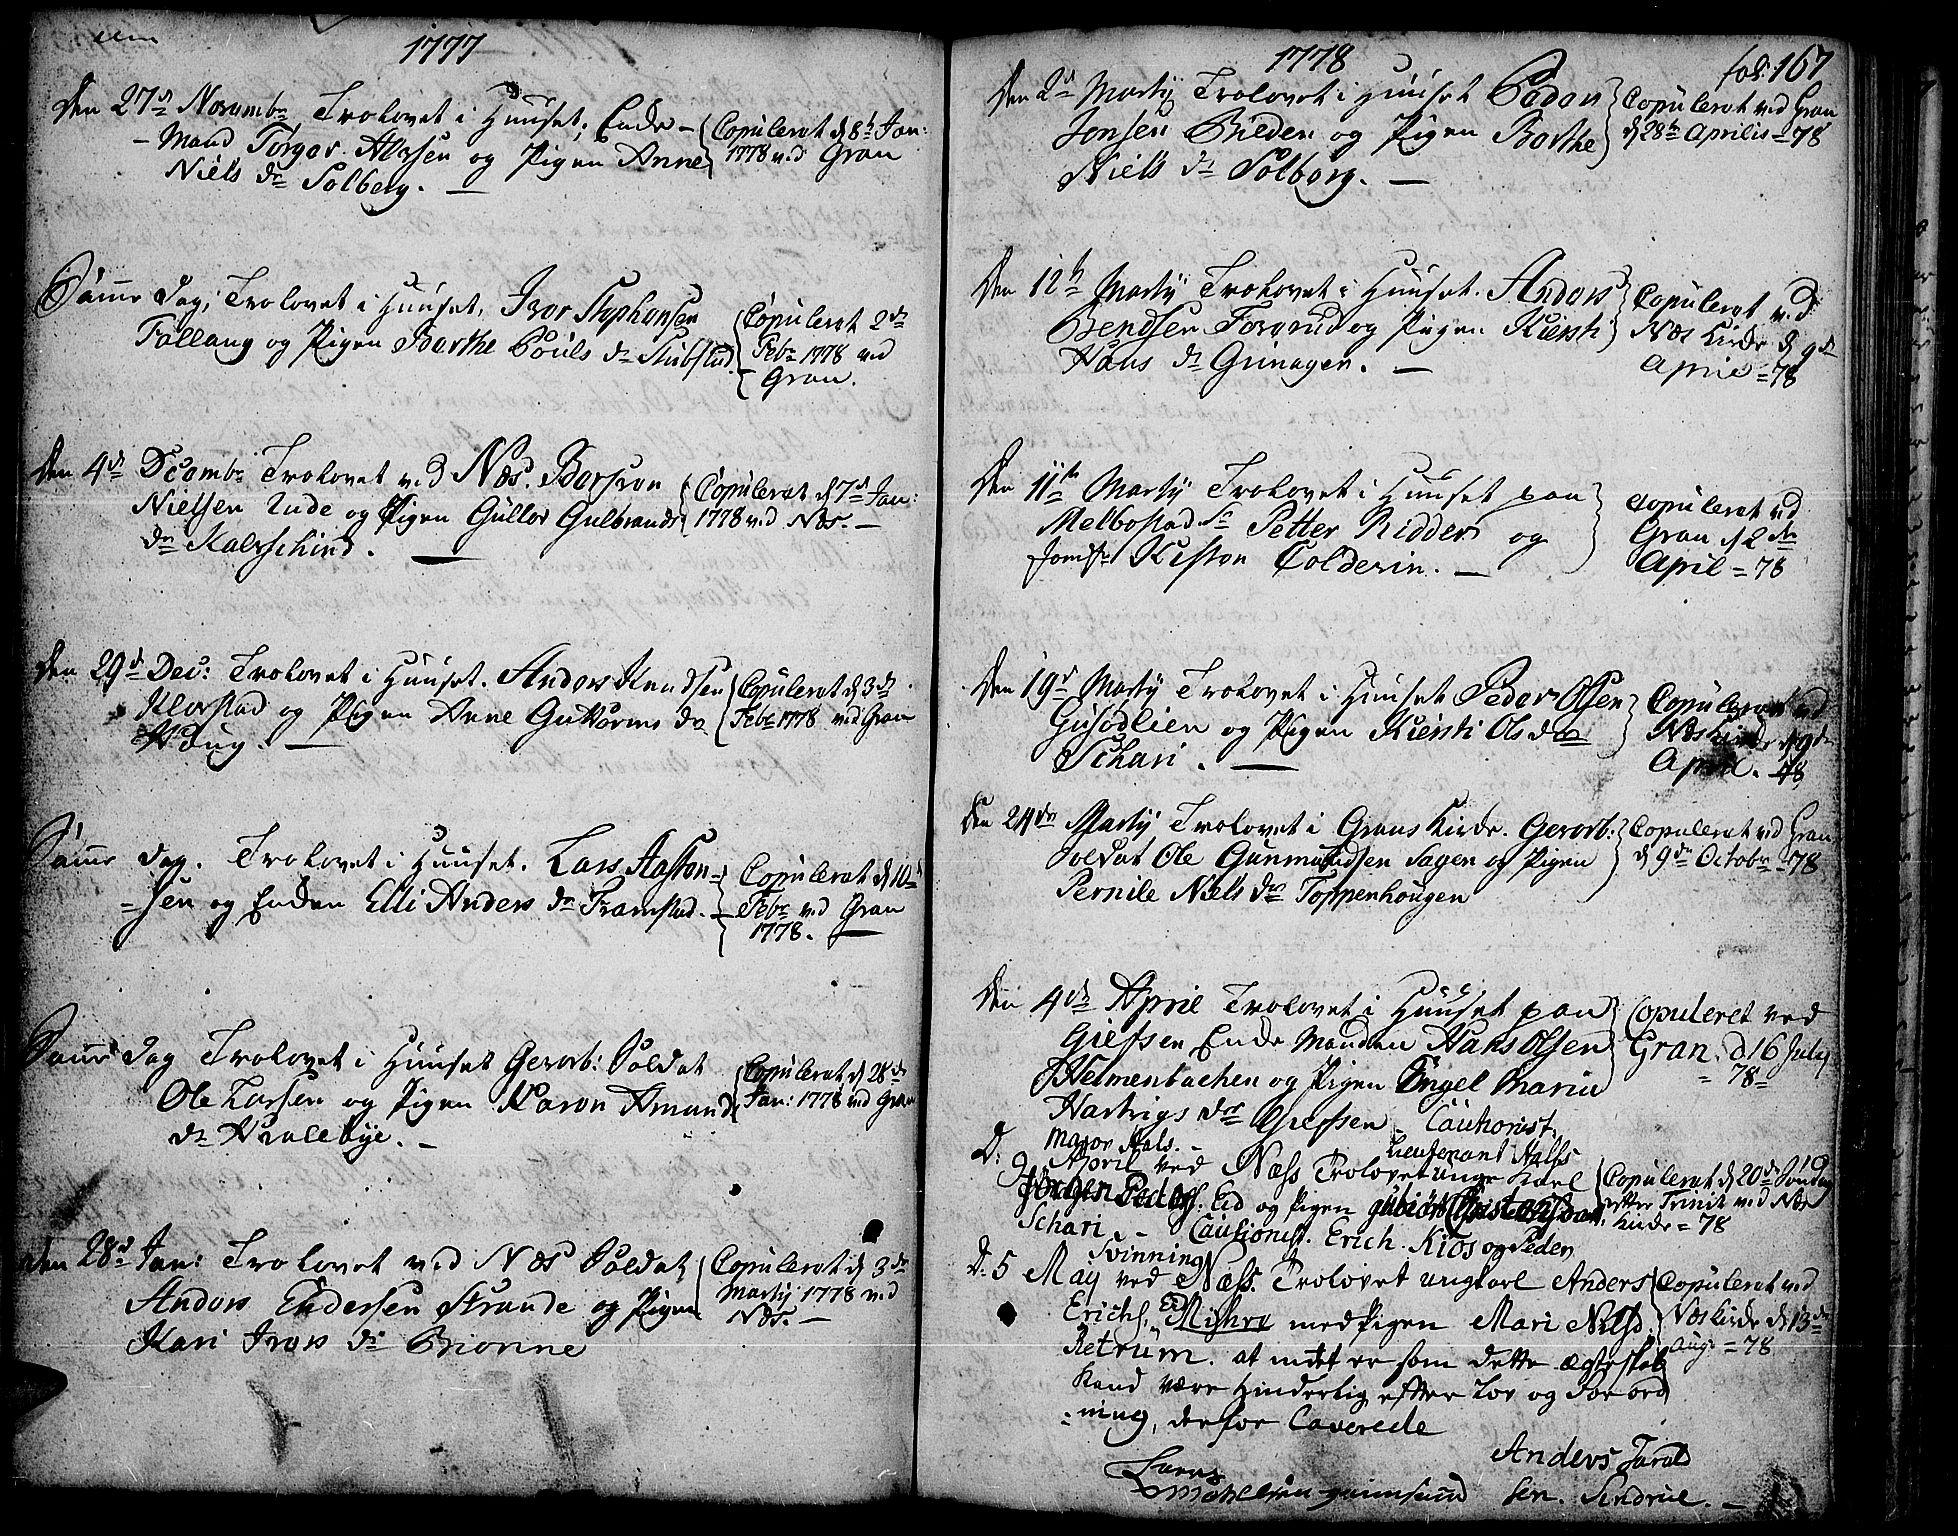 SAH, Gran prestekontor, Ministerialbok nr. 5, 1776-1788, s. 167